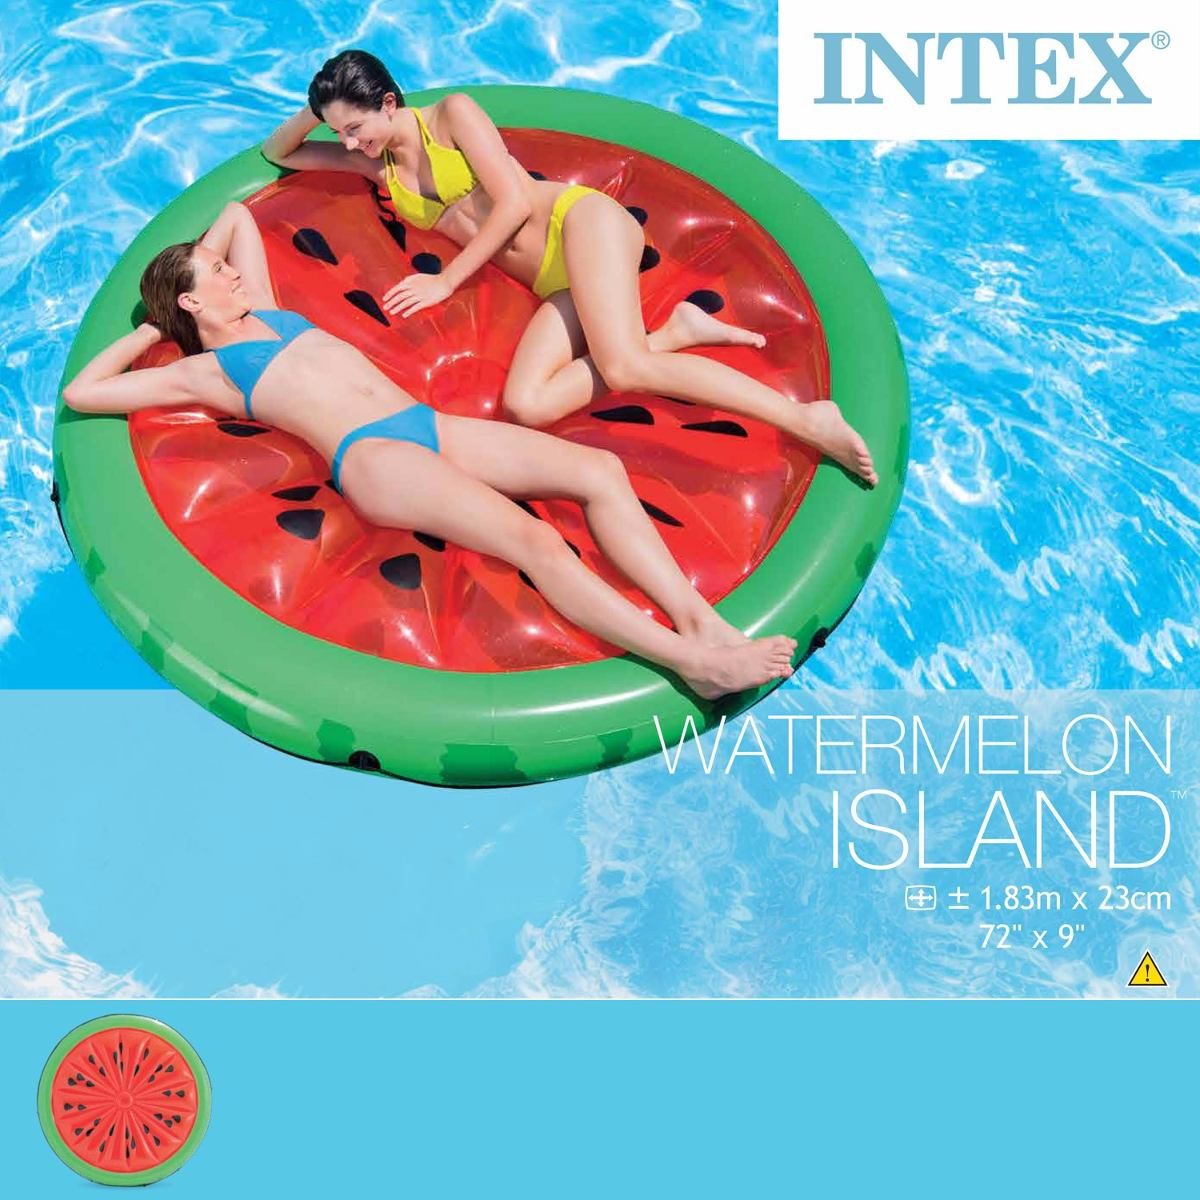 Isla cama flotante inflable de alberca sandia intex m for Albercas intex precios